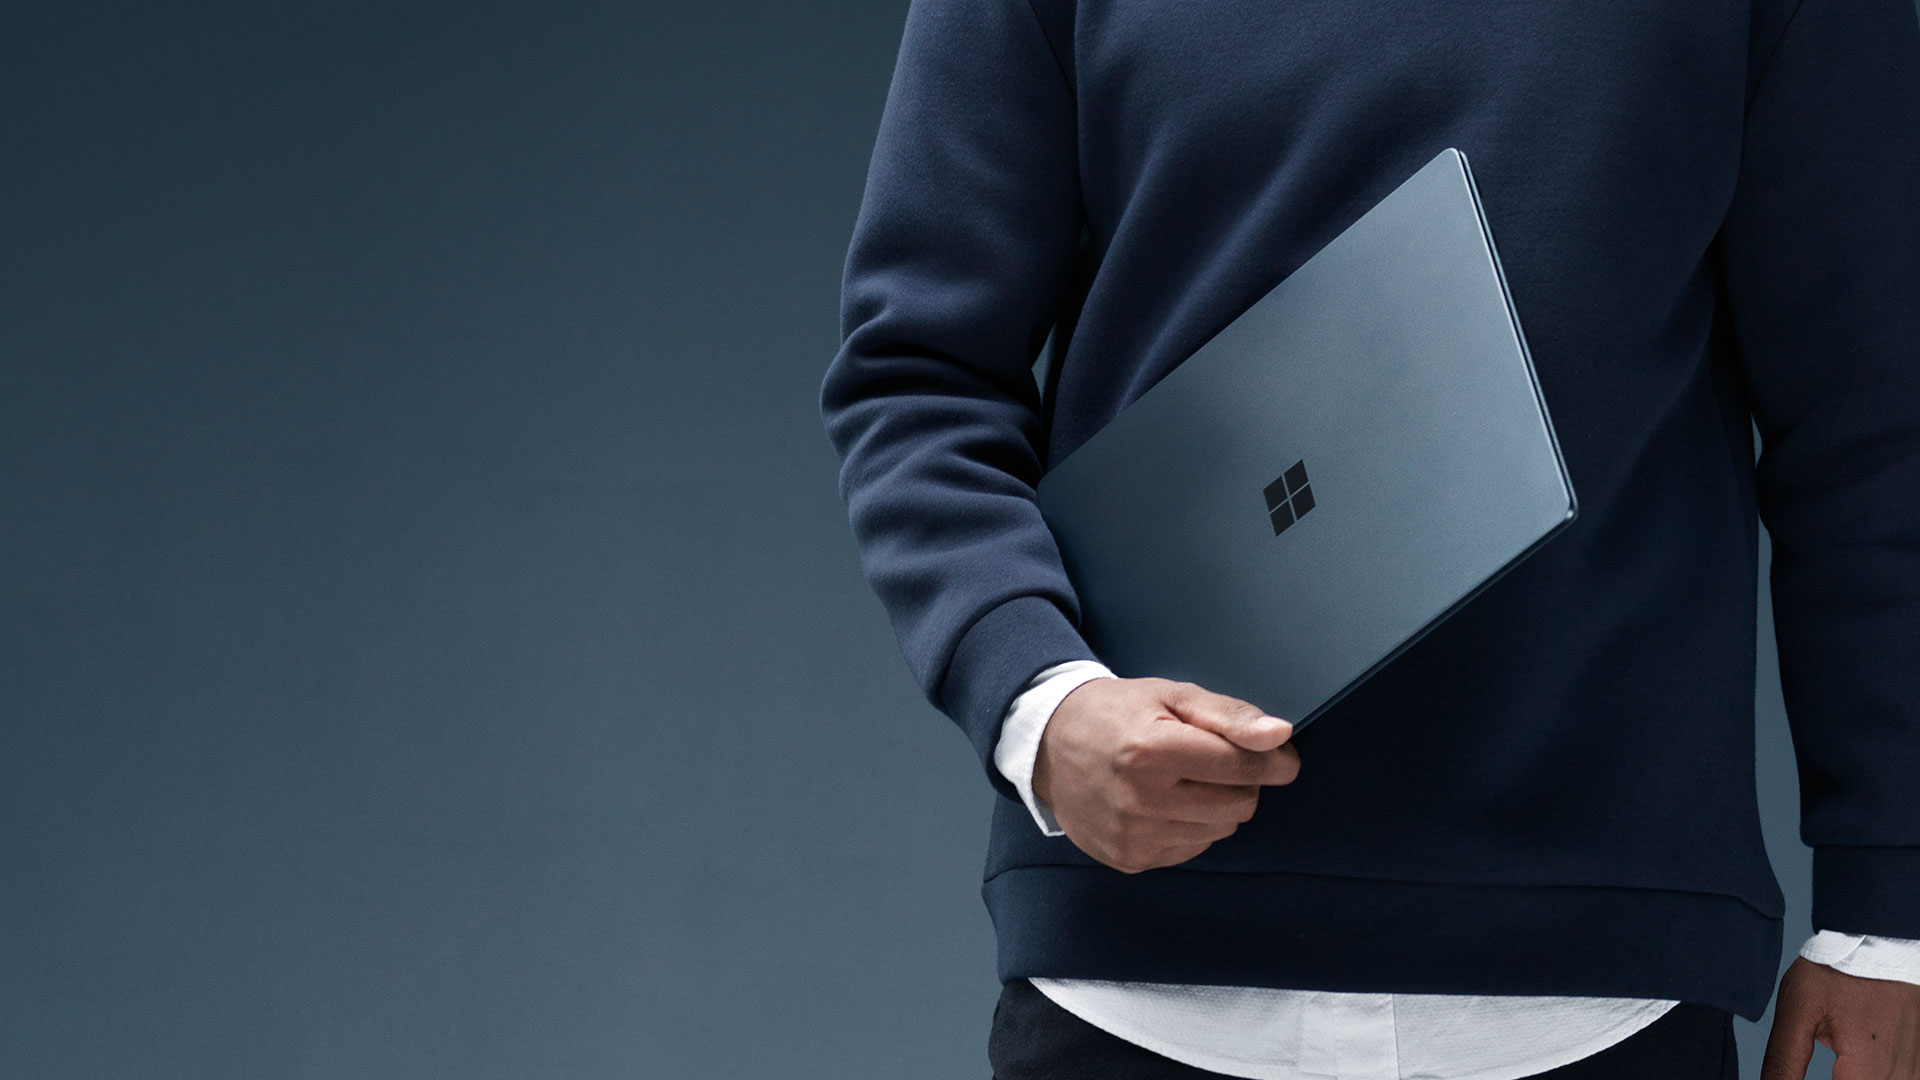 Man holding Cobalt Blue Surface Laptop